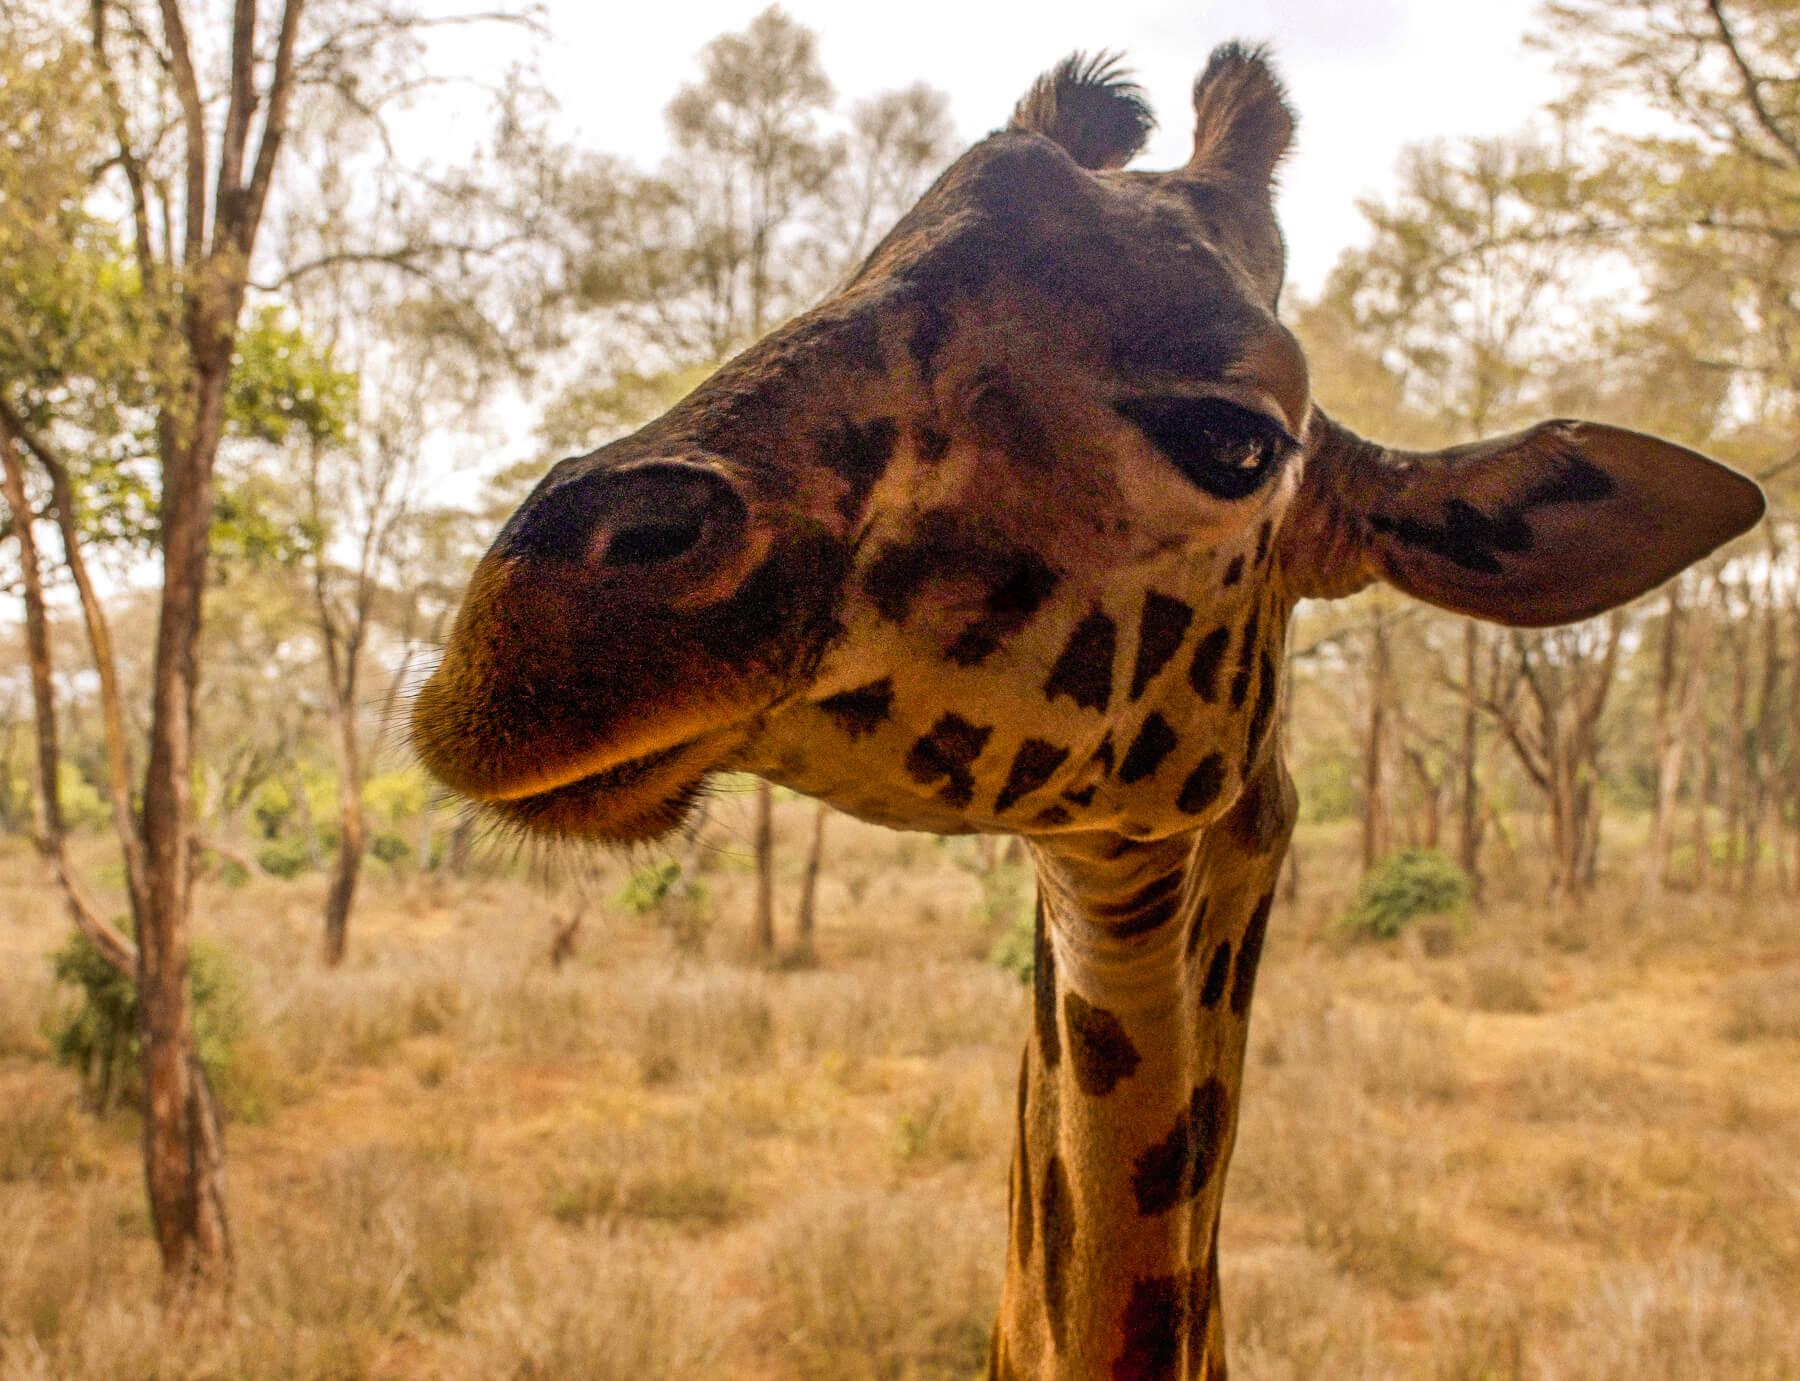 Close up of the head of a Giraffe